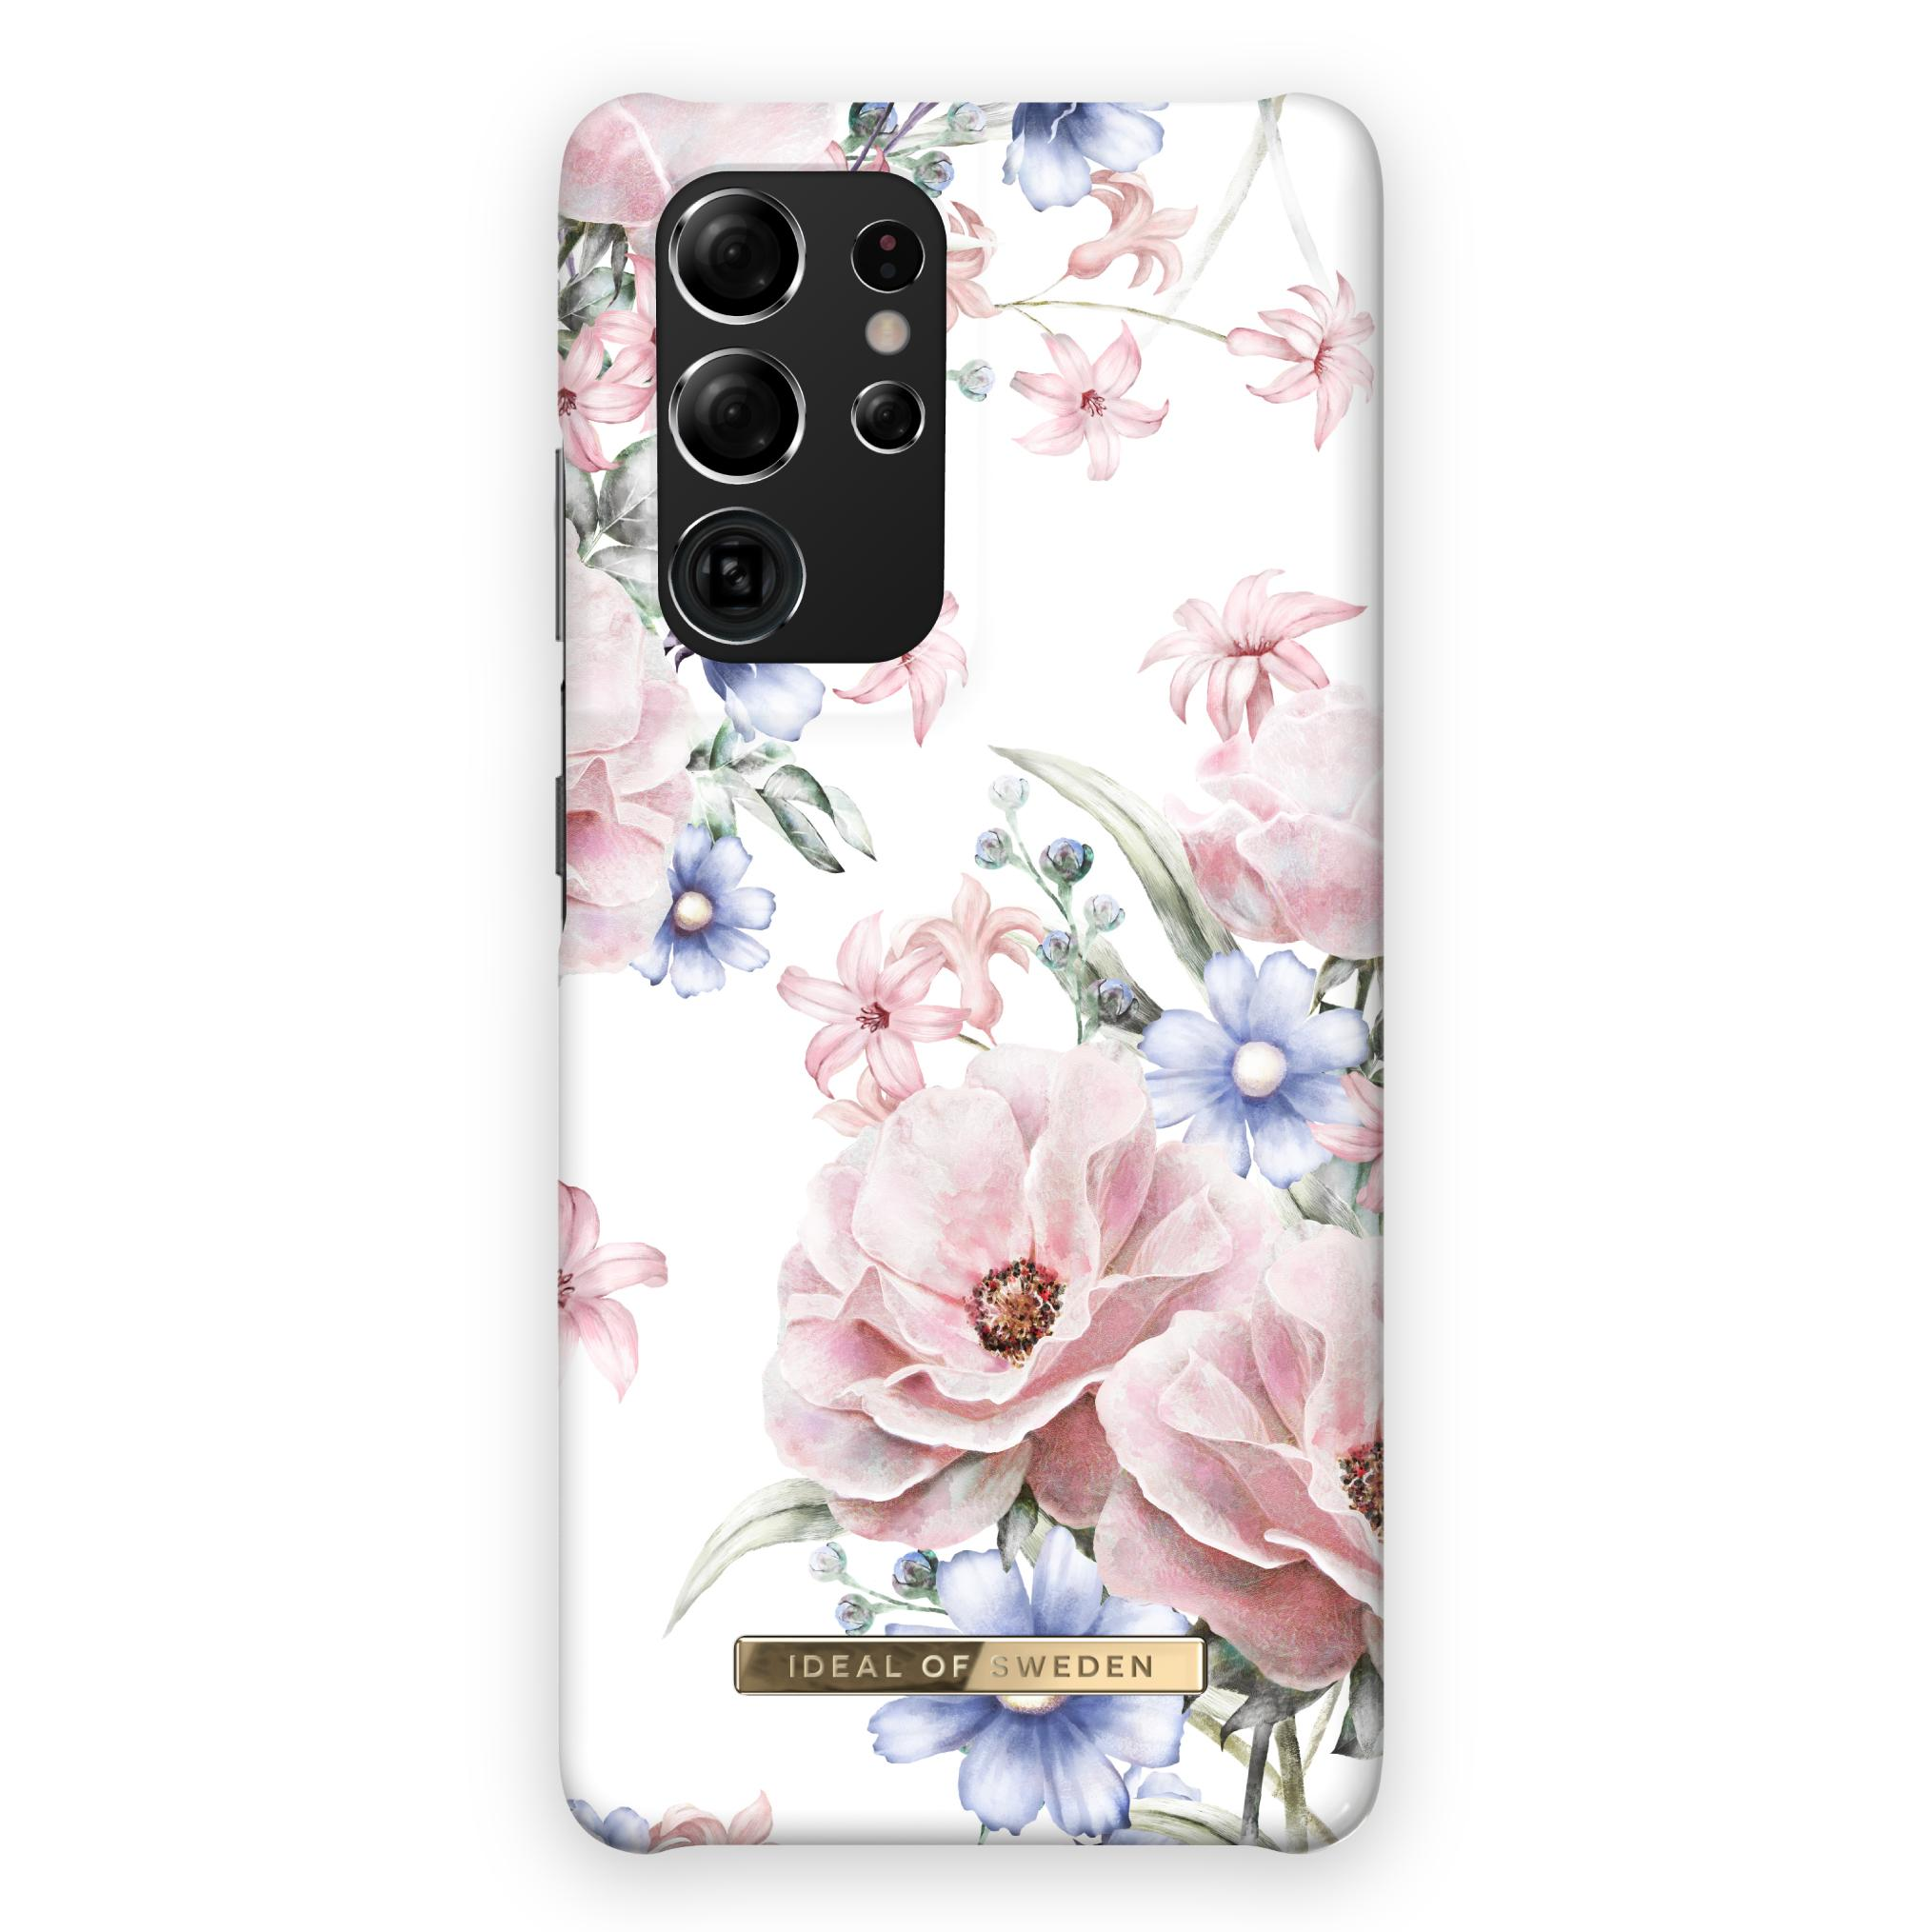 Fashion Case Galaxy S21 Ultra Floral Romance